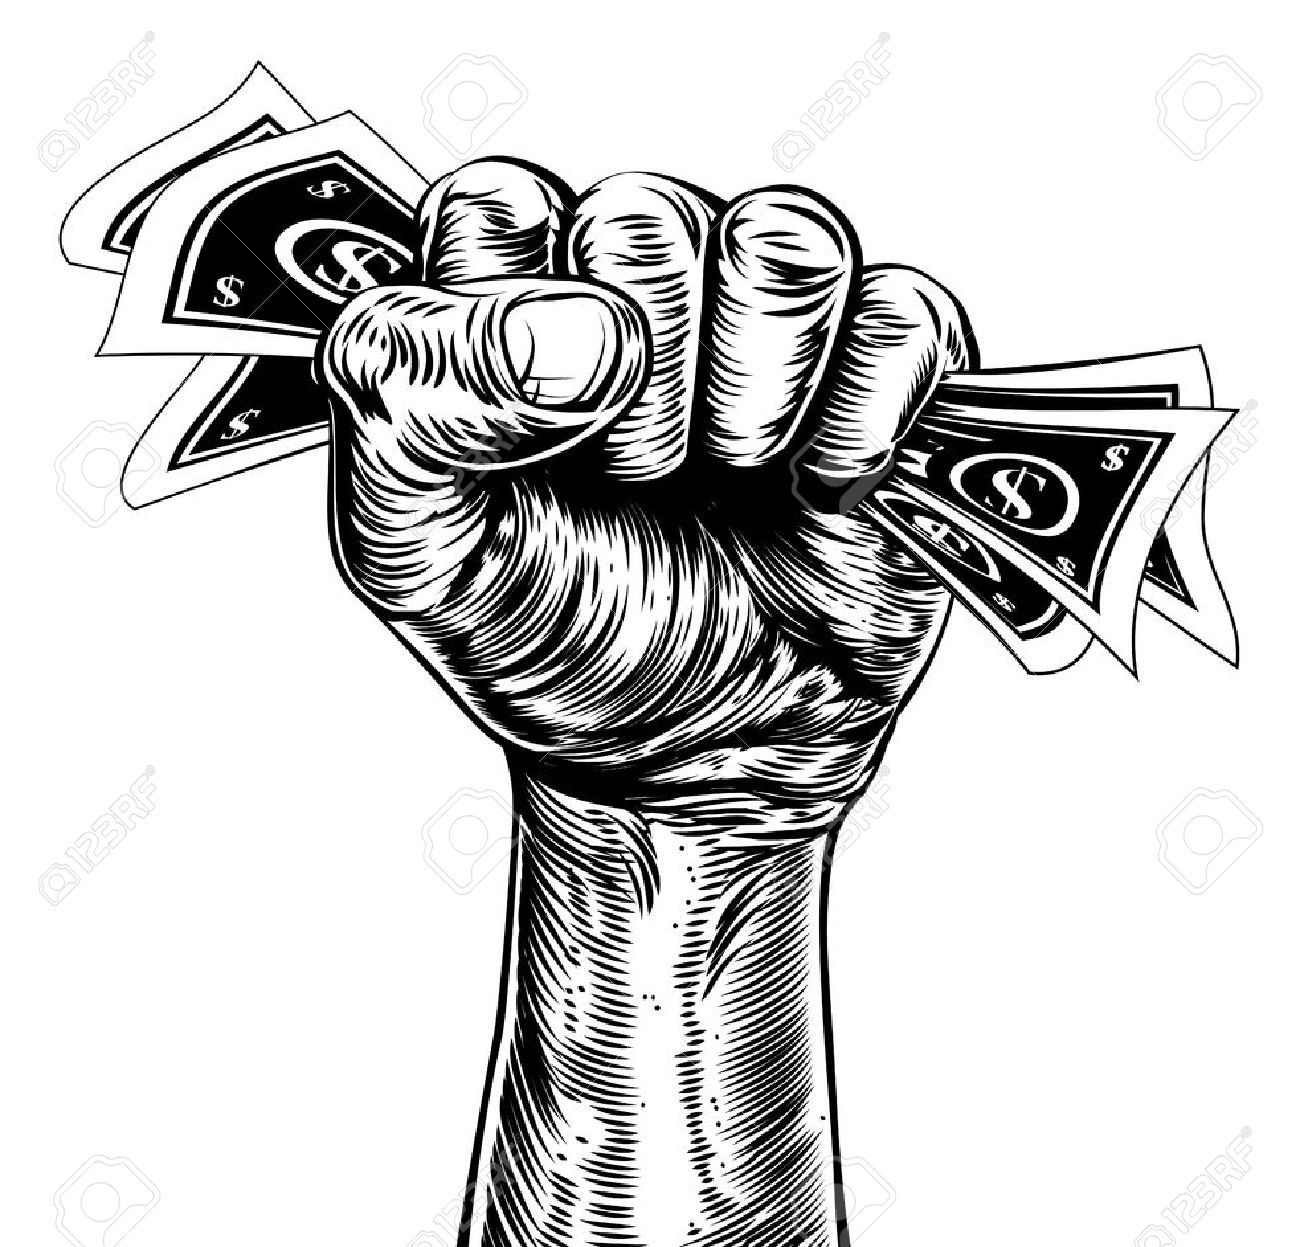 Stock Vector Black power fist in 2019 Free vector